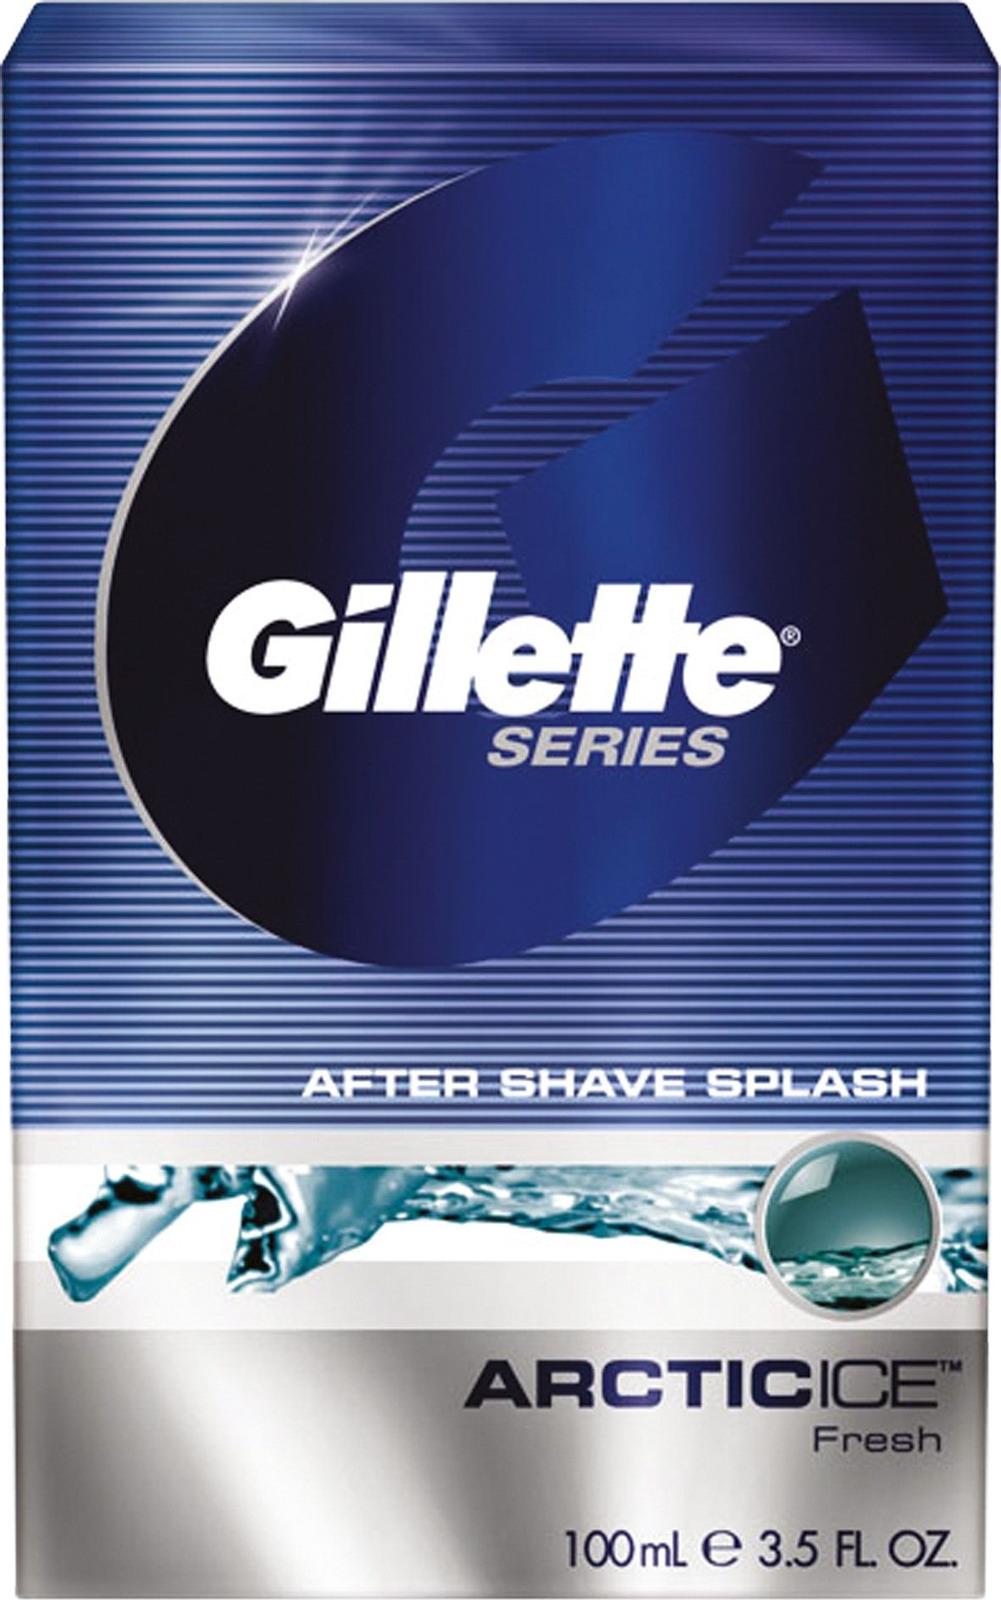 Лосьон после бритья Gillette Series Arctic Ice Бодрящий, 100 мл gillette лосьон после бритья cool wave 100 мл page 2